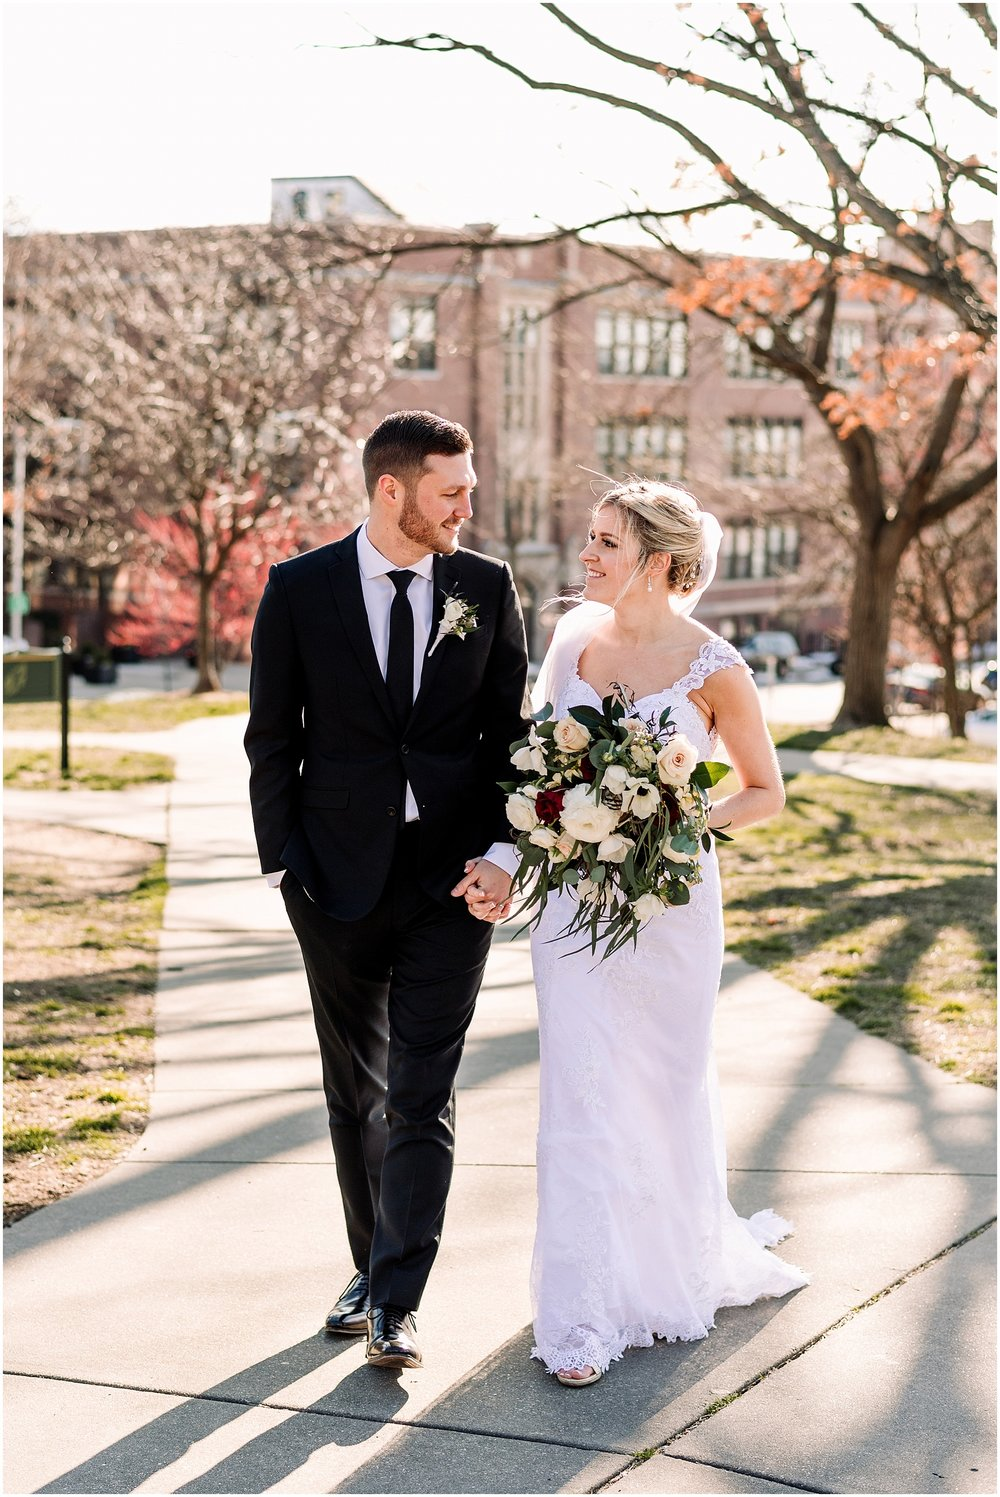 Hannah Leigh Photography Belvedere Wedding Baltimore MD_7251.jpg